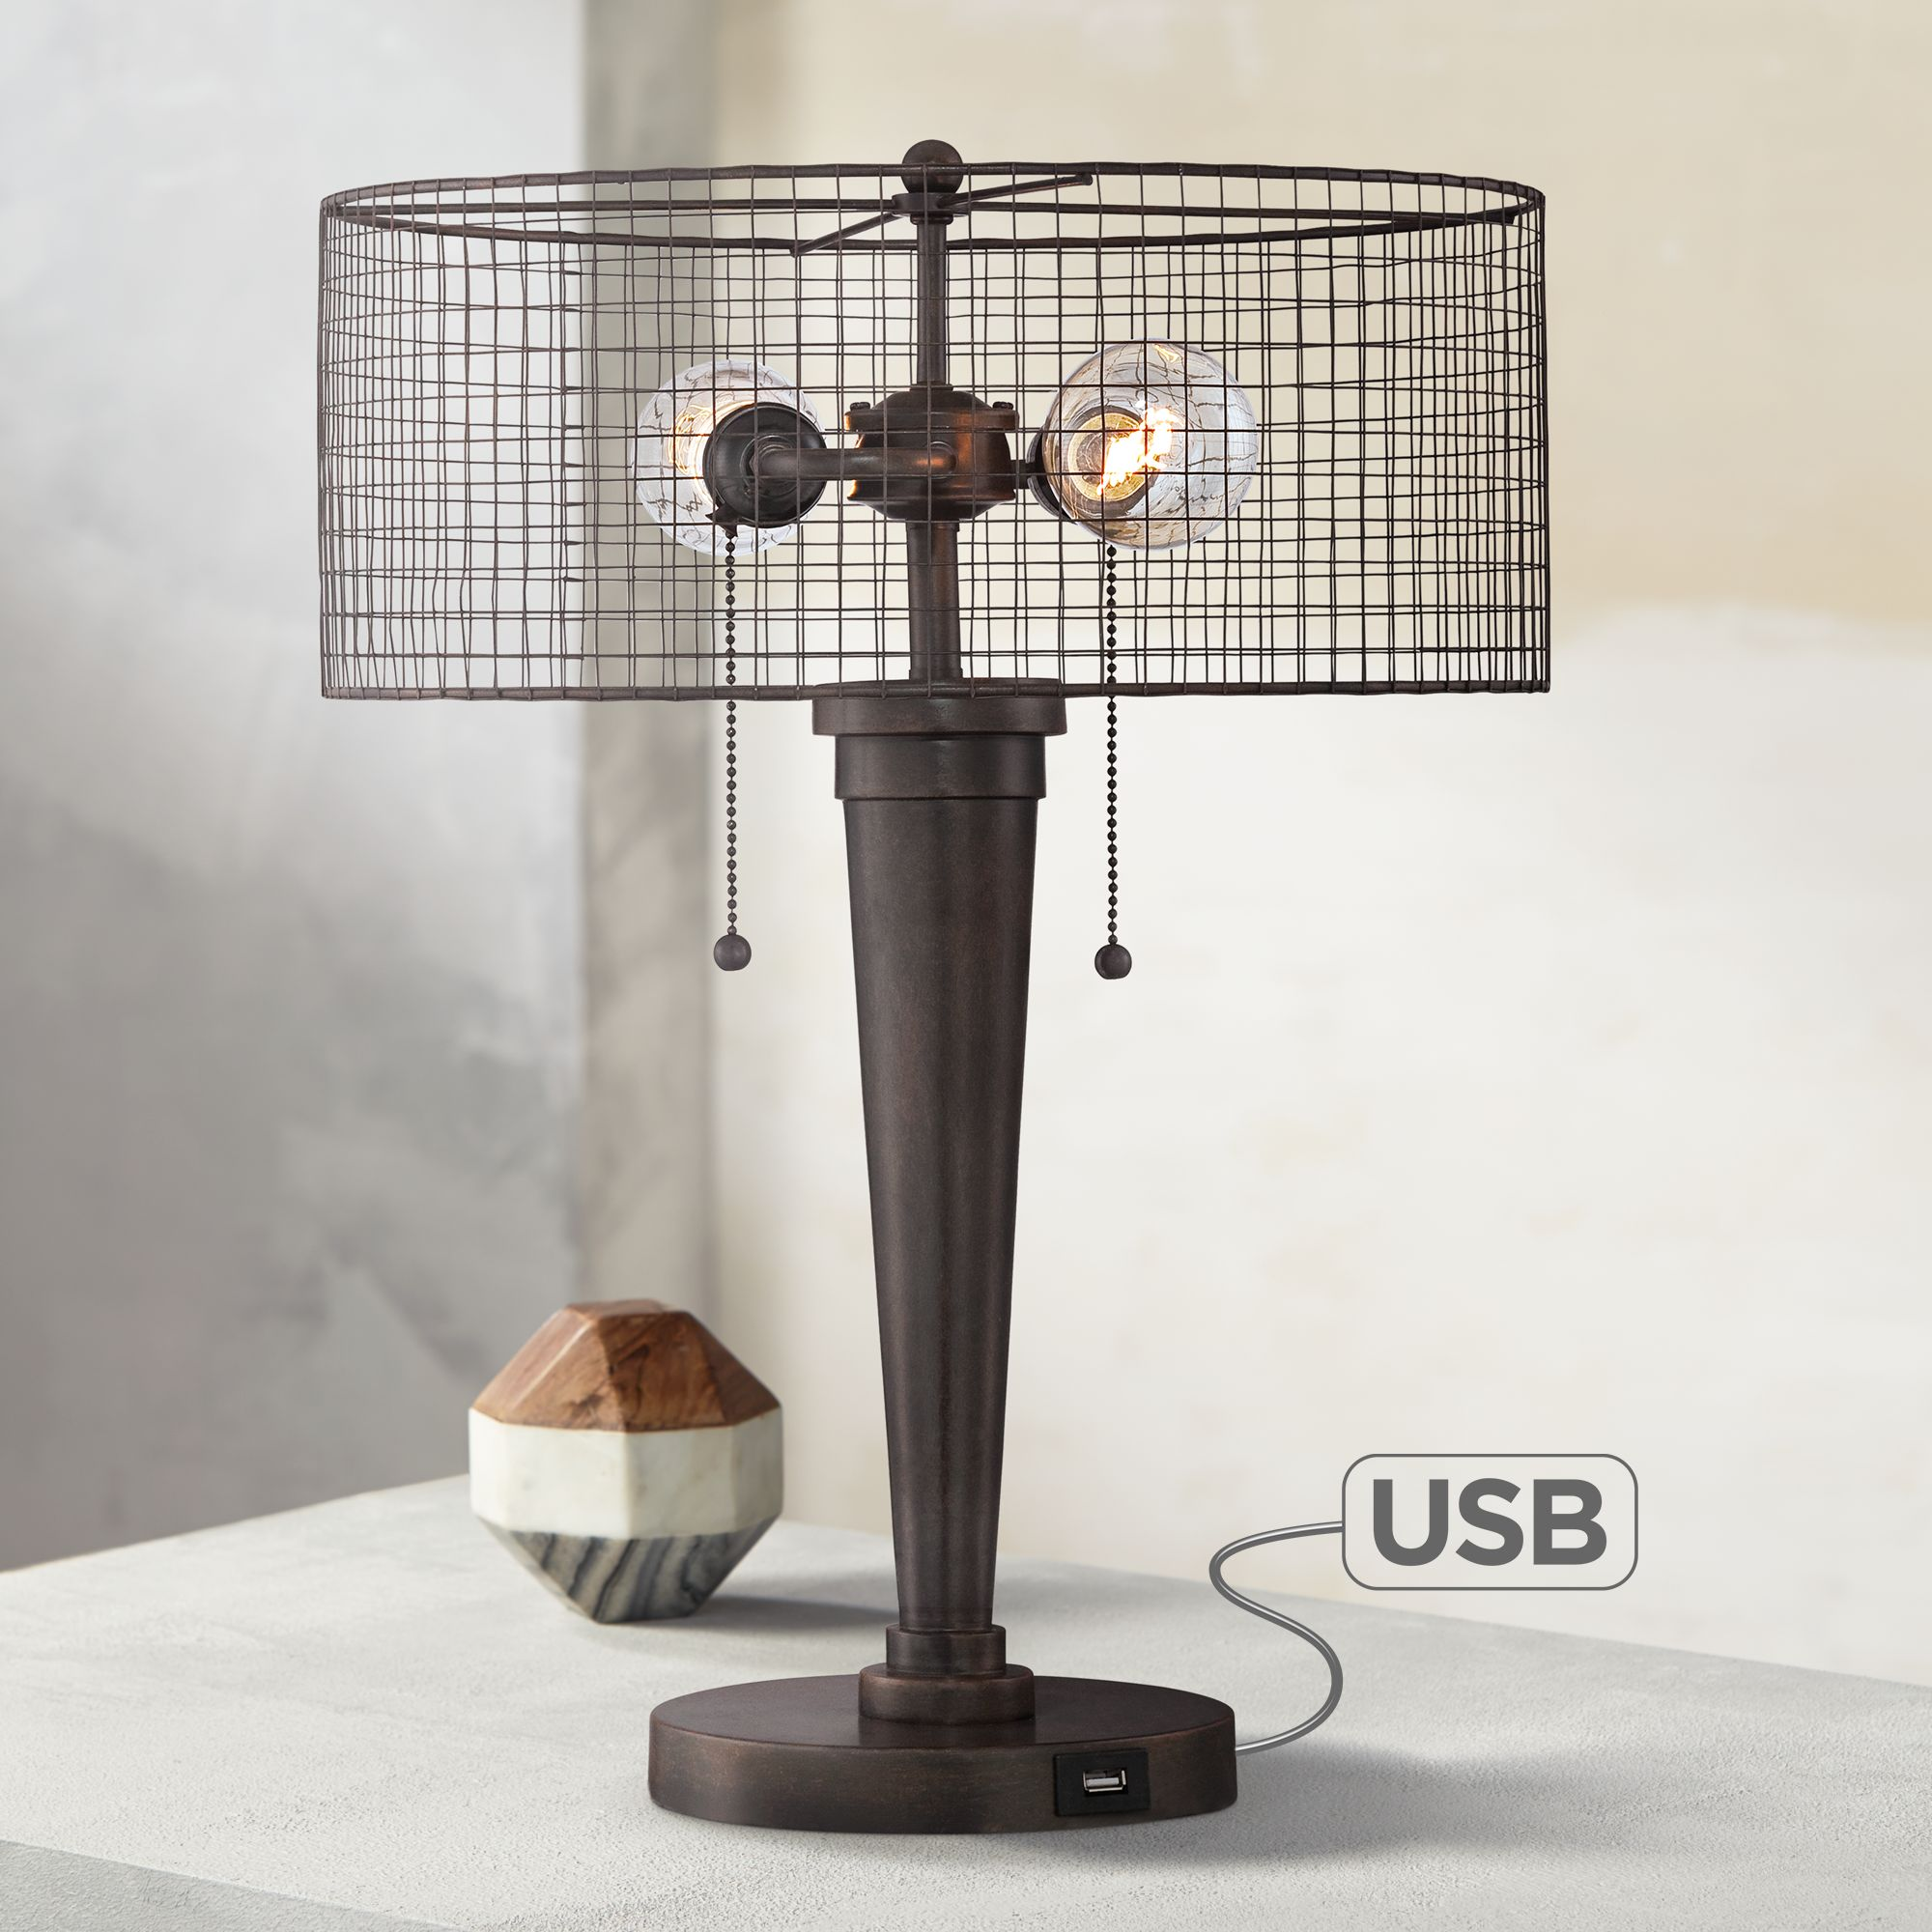 Usb Lamps